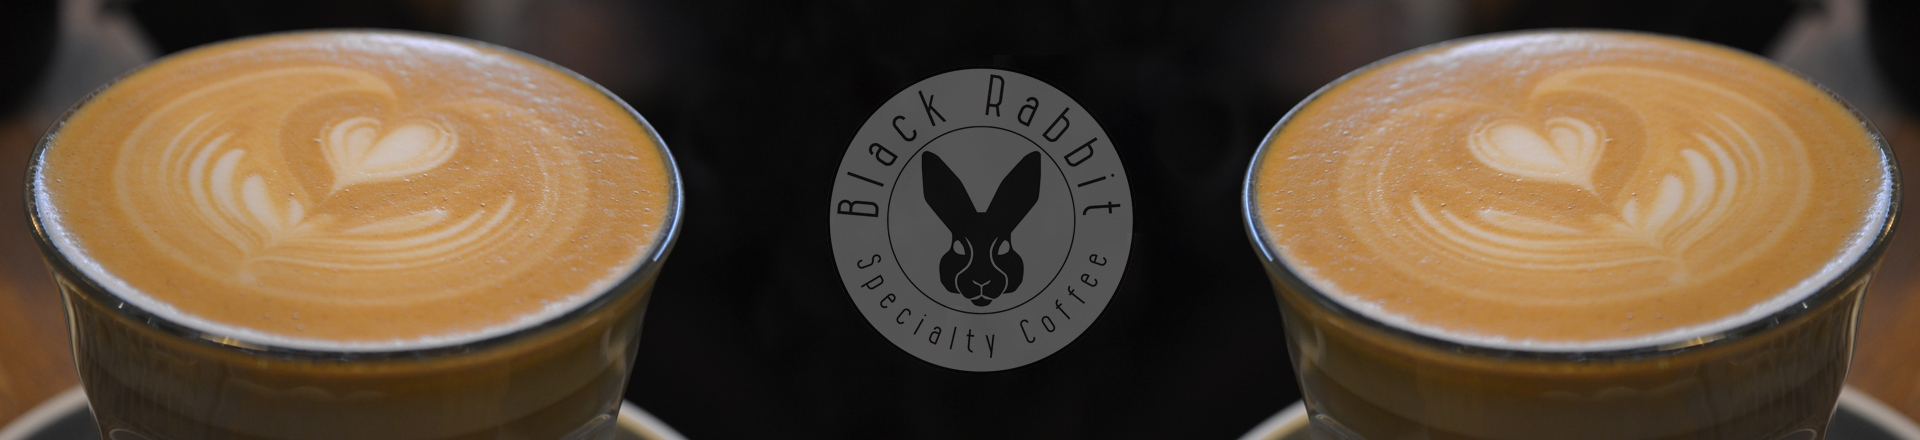 About Black Rabbit Cafe